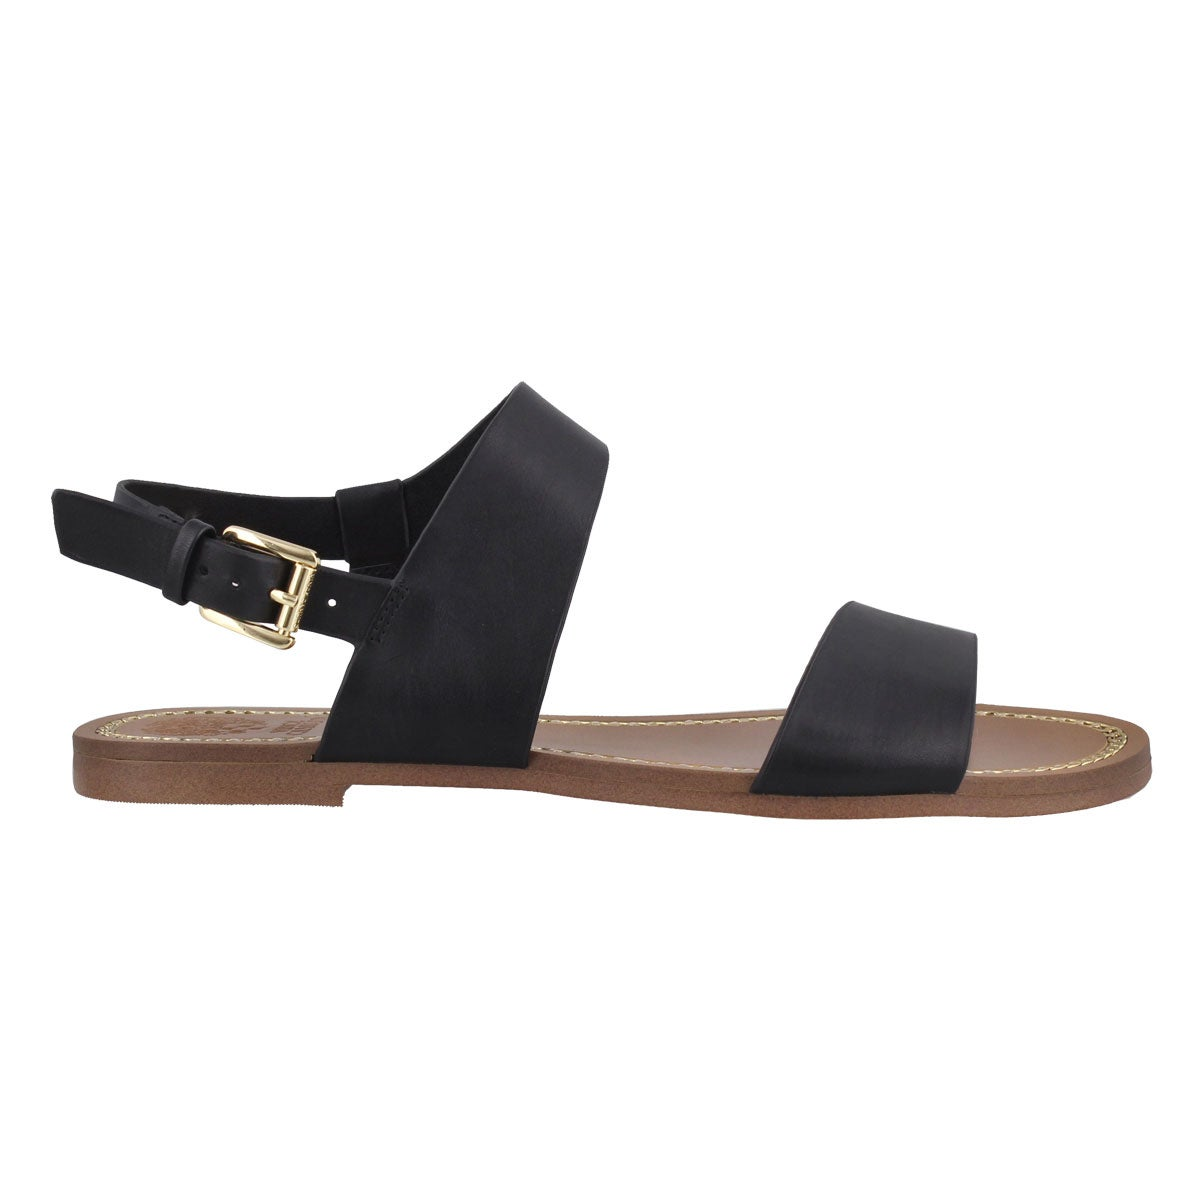 Lds Rentin blk dress sandal